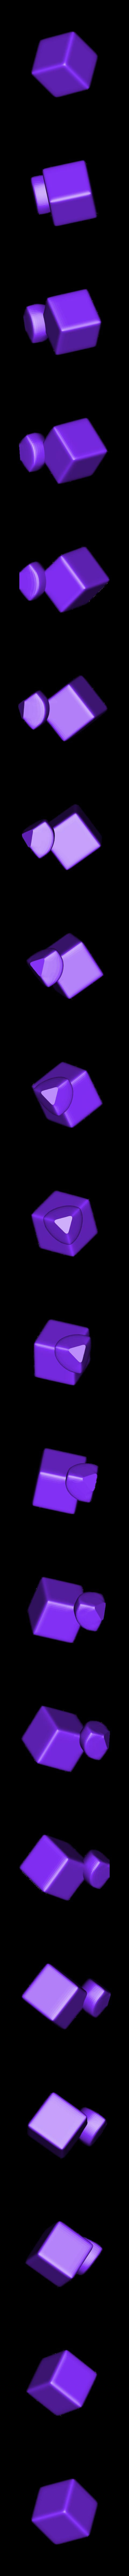 corner_v4.stl Télécharger fichier STL gratuit Rubik's Magic Cube • Design à imprimer en 3D, Jimmydelgadinho45